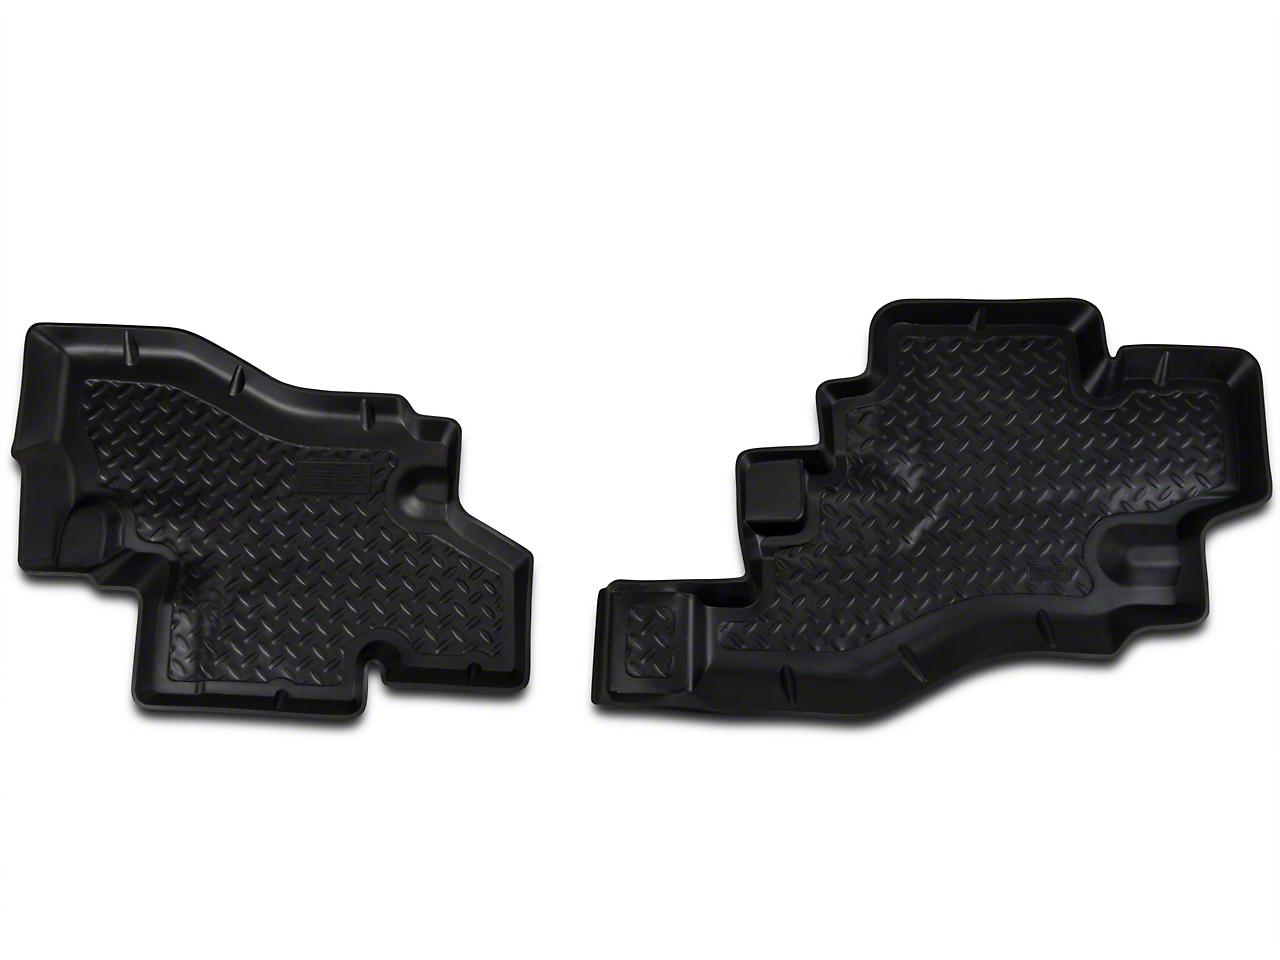 Husky Rear Floor Liner Black (87-90 Wrangler YJ)